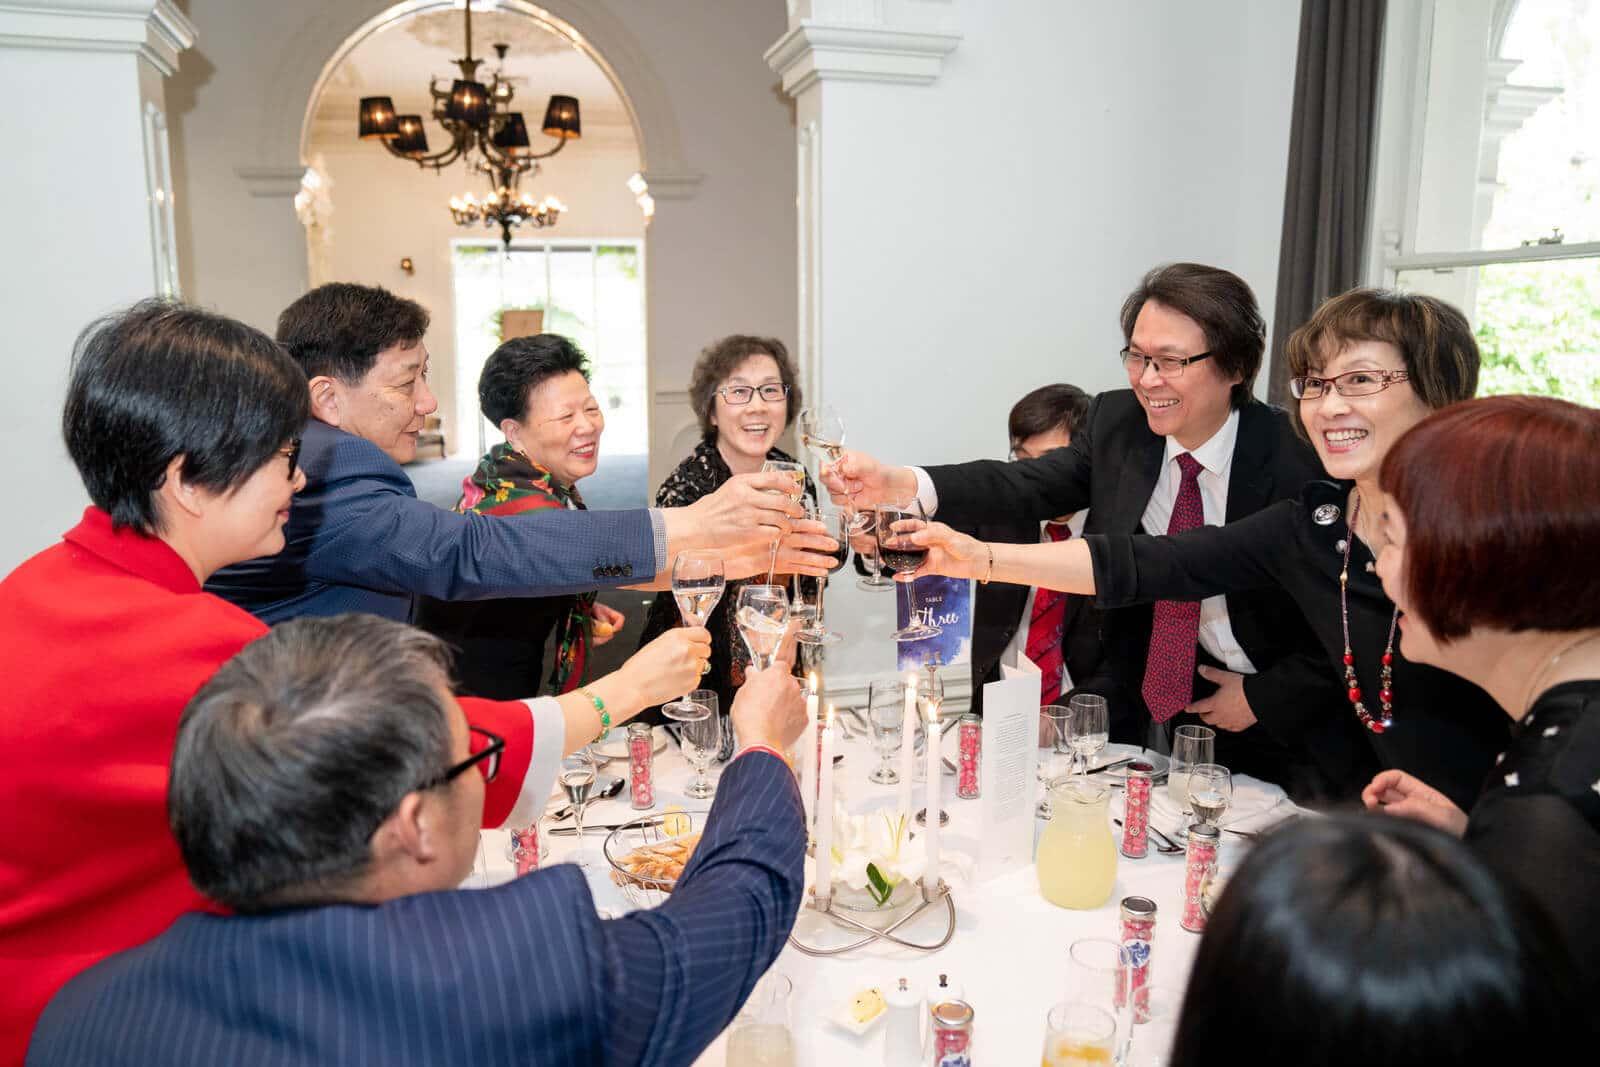 Quat Quatta | Wedding Reception